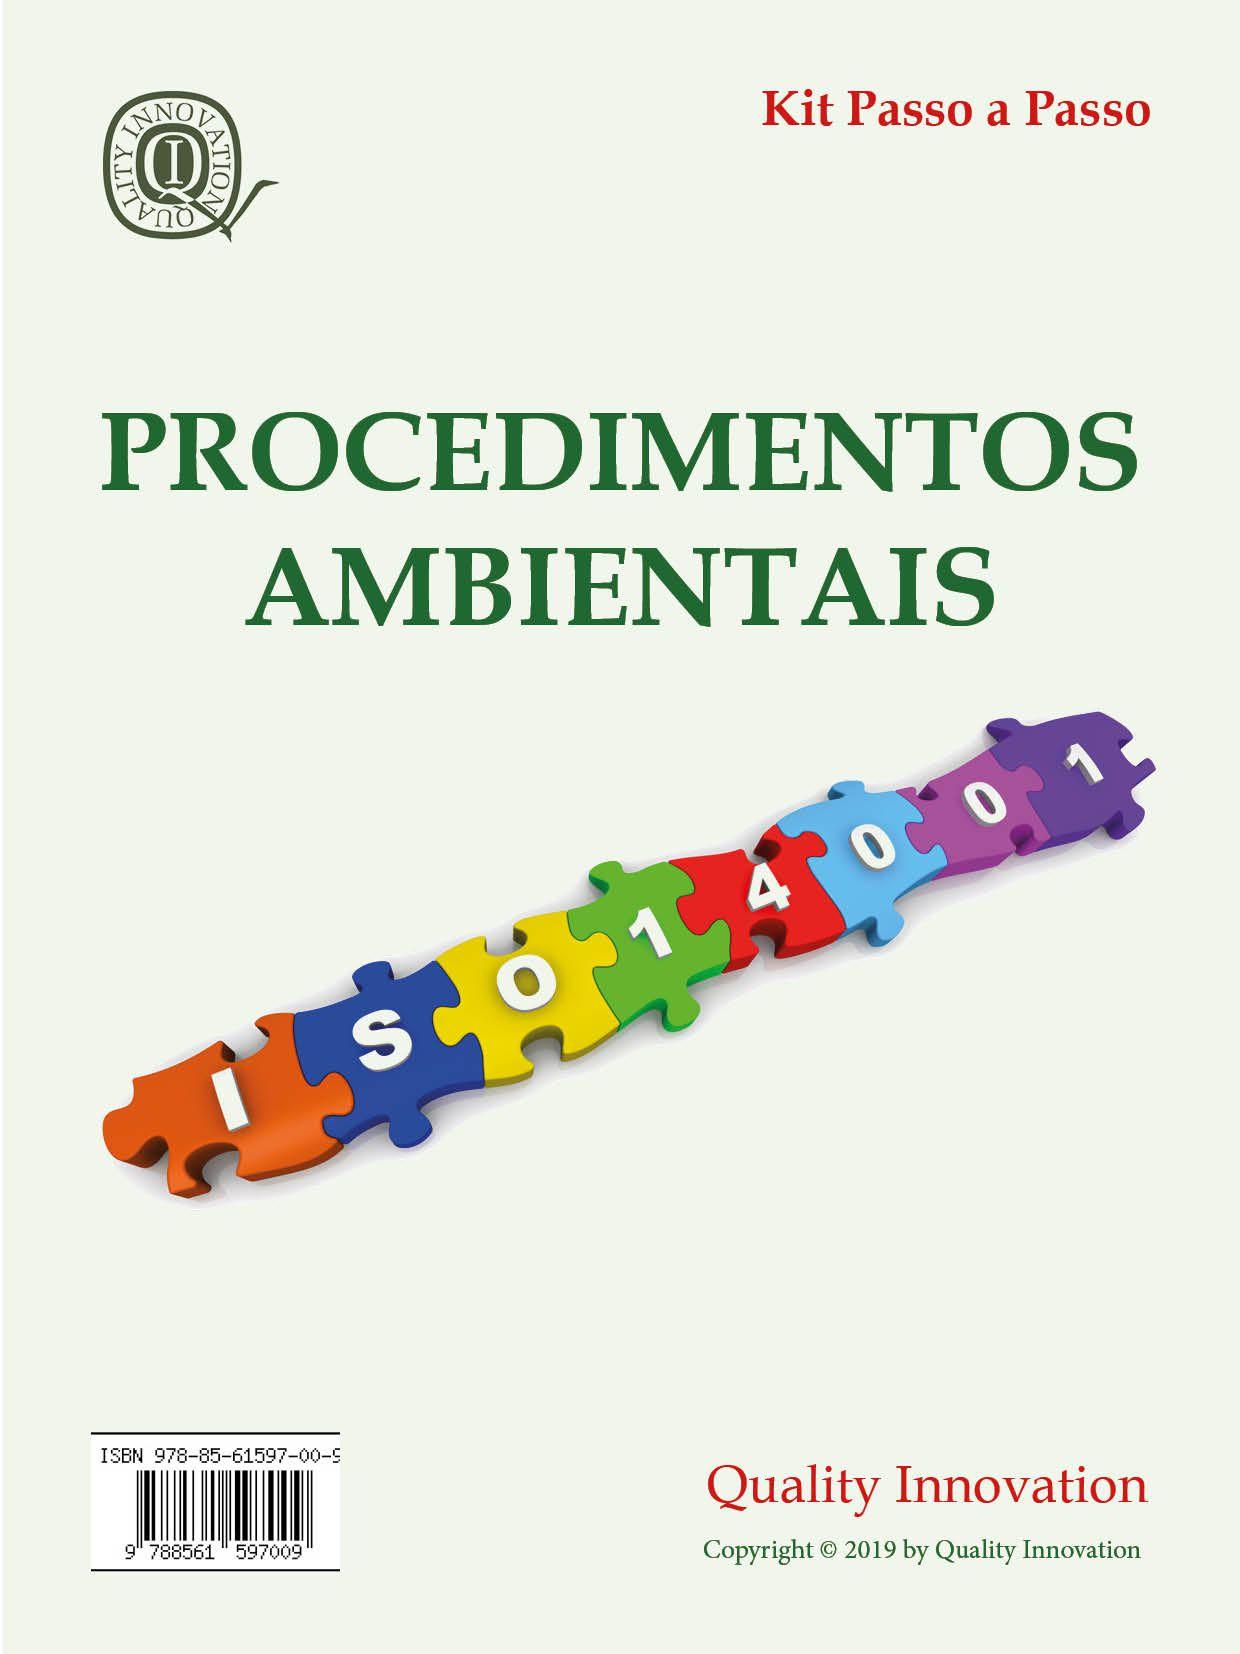 Procedimentos Ambientais da ISO 14001  - www.qualistore.net.br